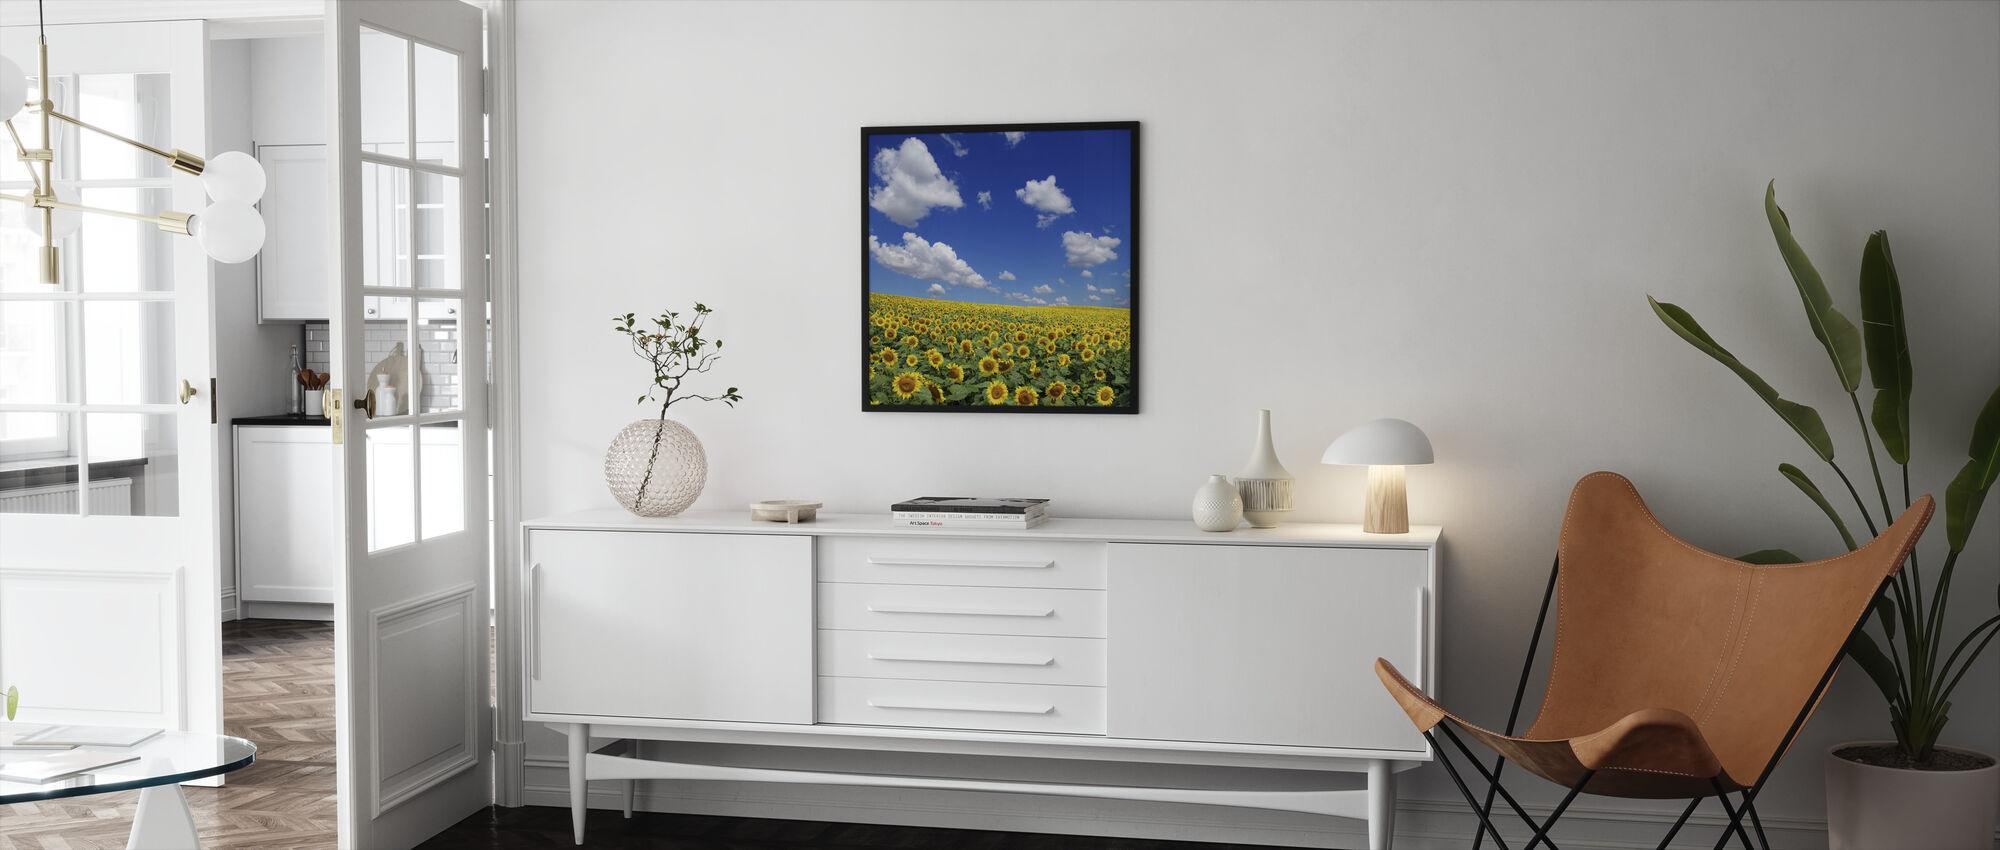 Zonnebloem veld - Ingelijste print - Woonkamer